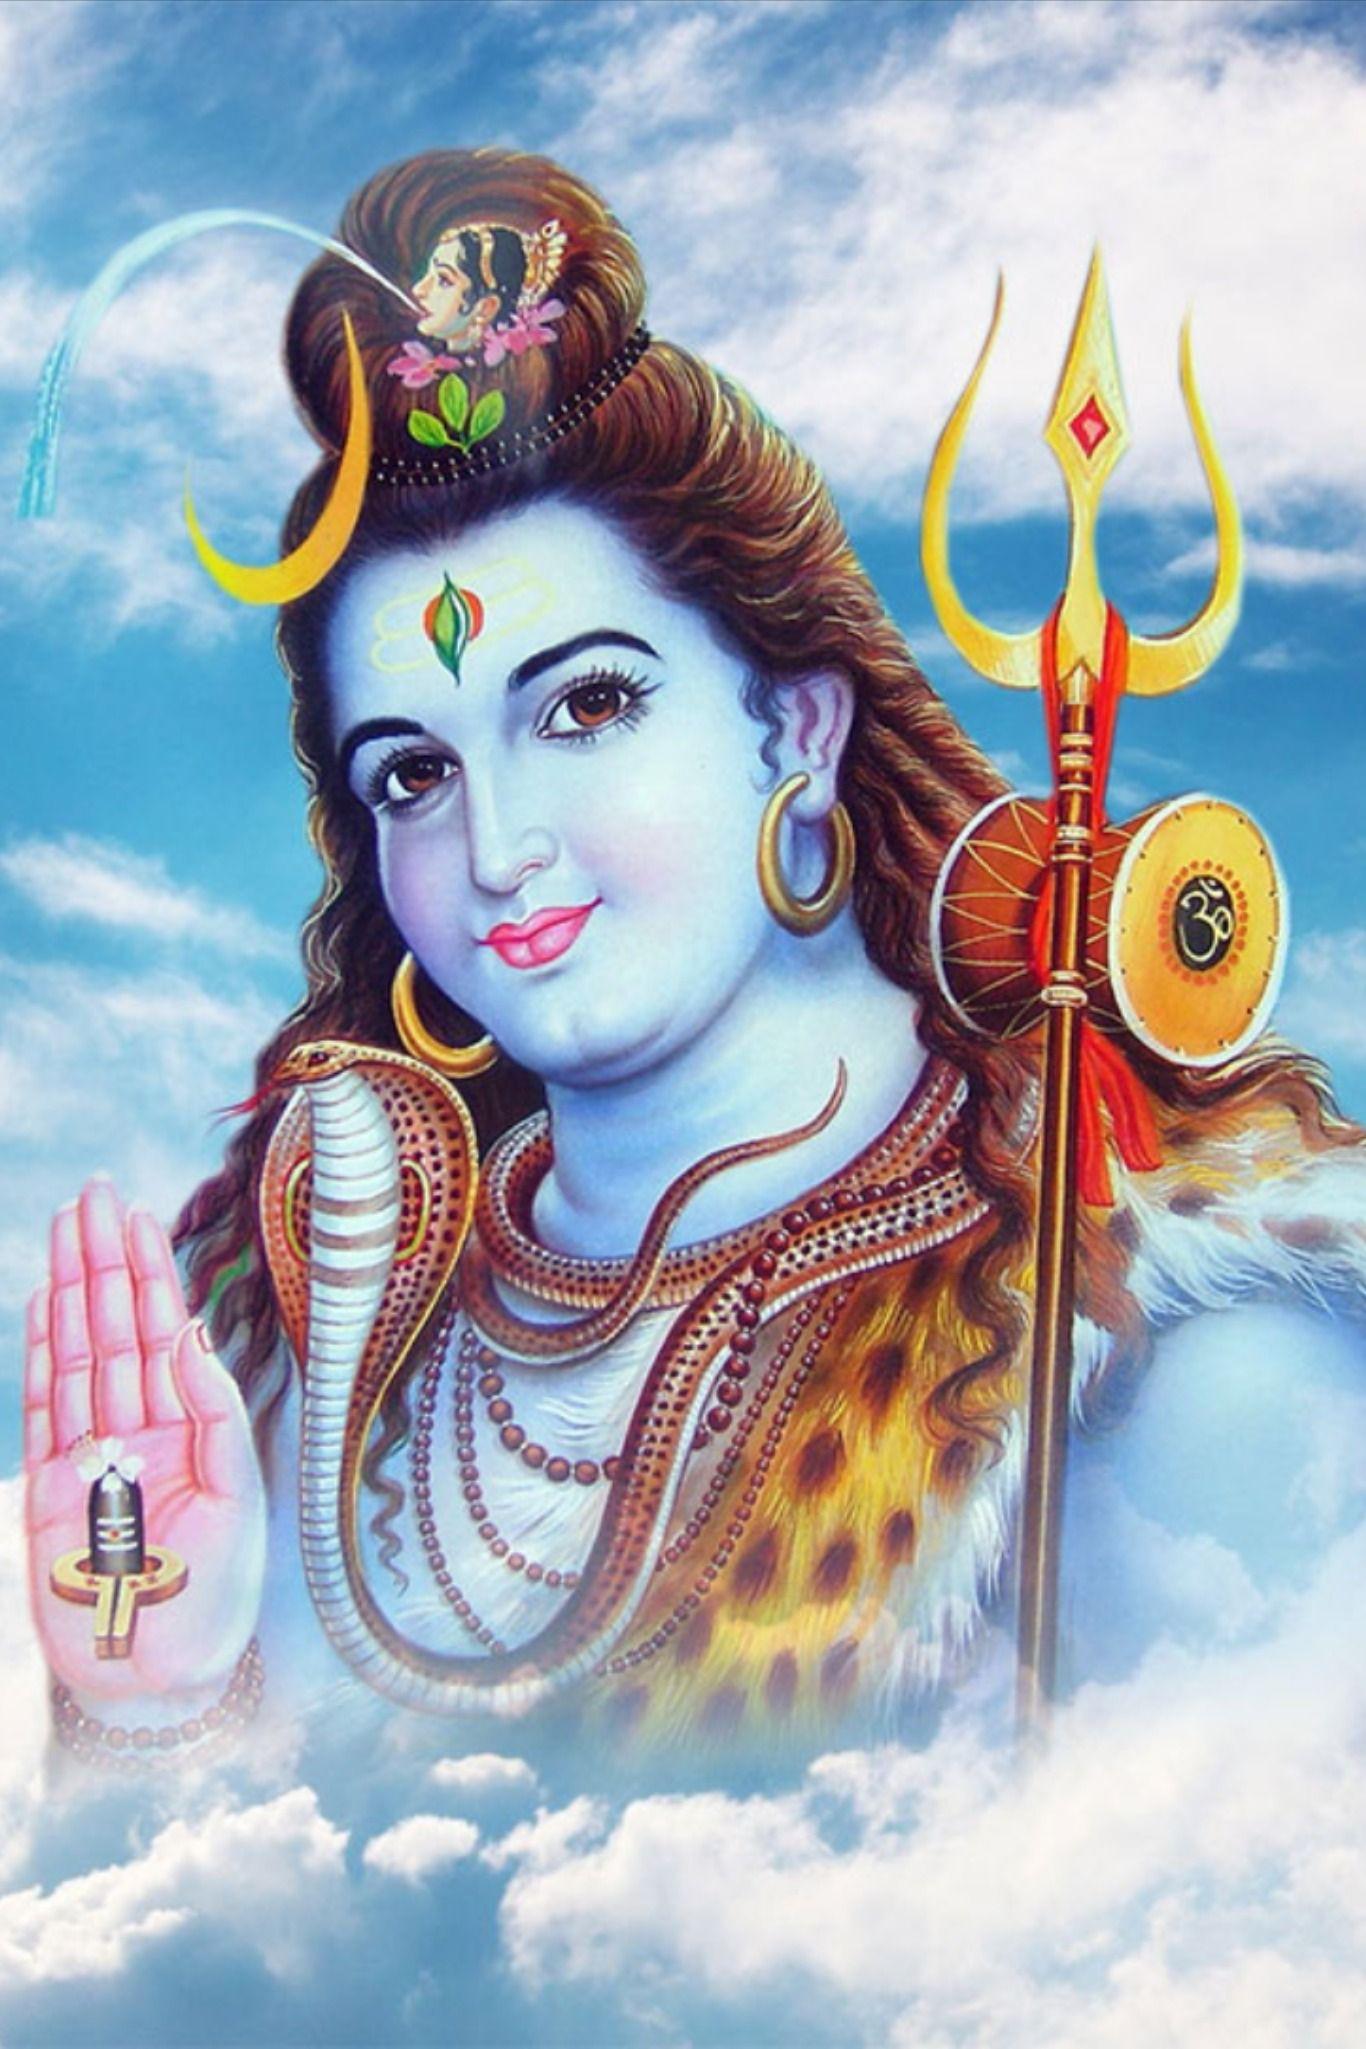 Maha Shivaratri 2020 in 2020 | Lord shiva hd wallpaper ...